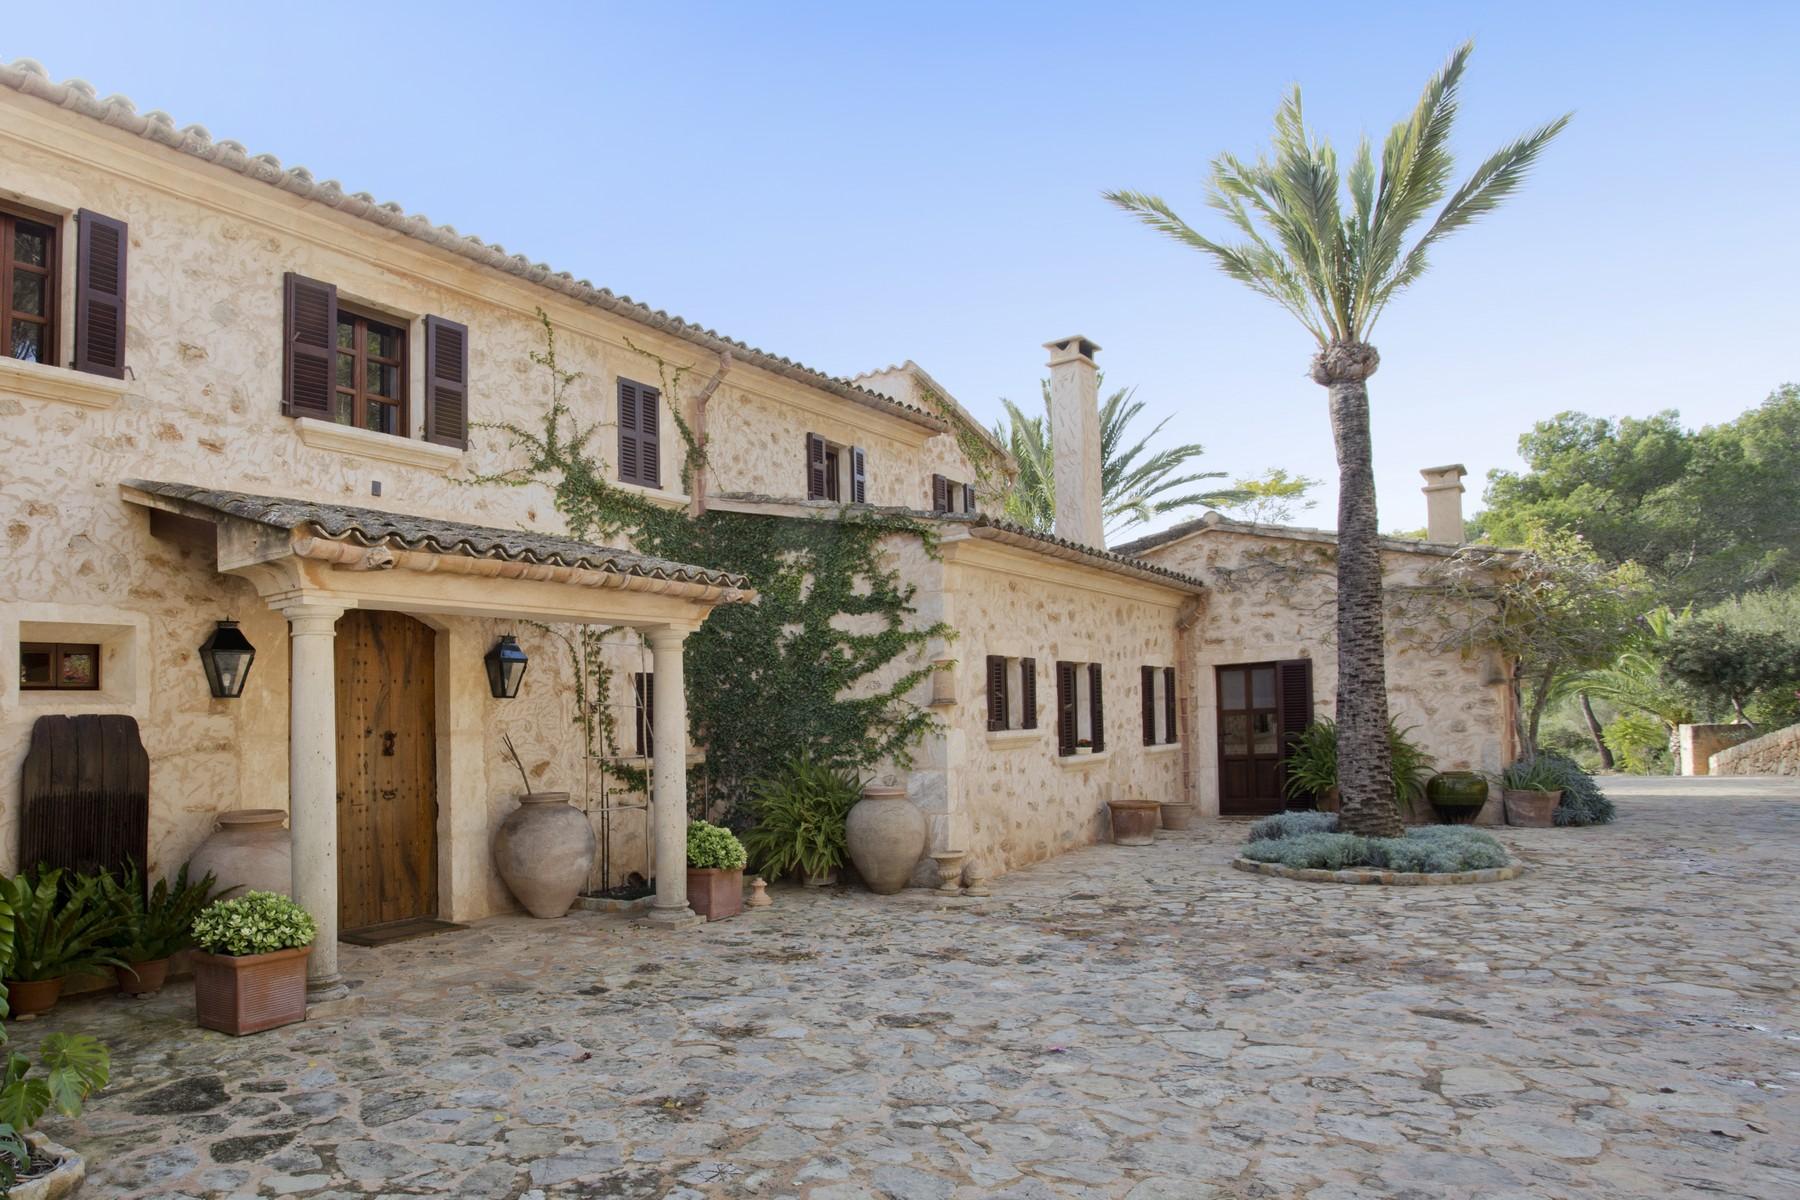 Single Family Home for Sale at Charming country house in Son Macia Porto Cristo, Mallorca 07001 Spain